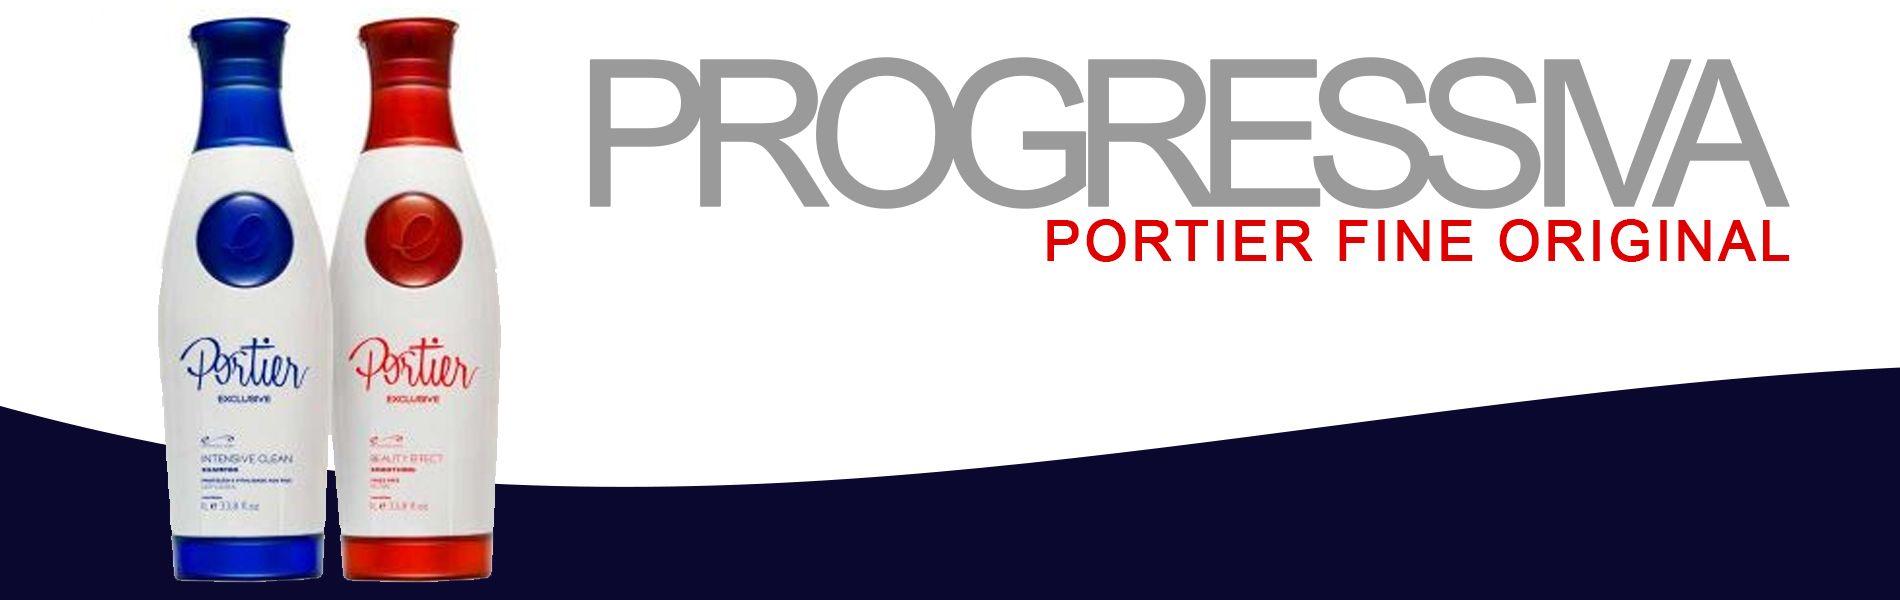 https://goyaperfumaria.com.br/progressiva-portier-fine-original-2x1l.html